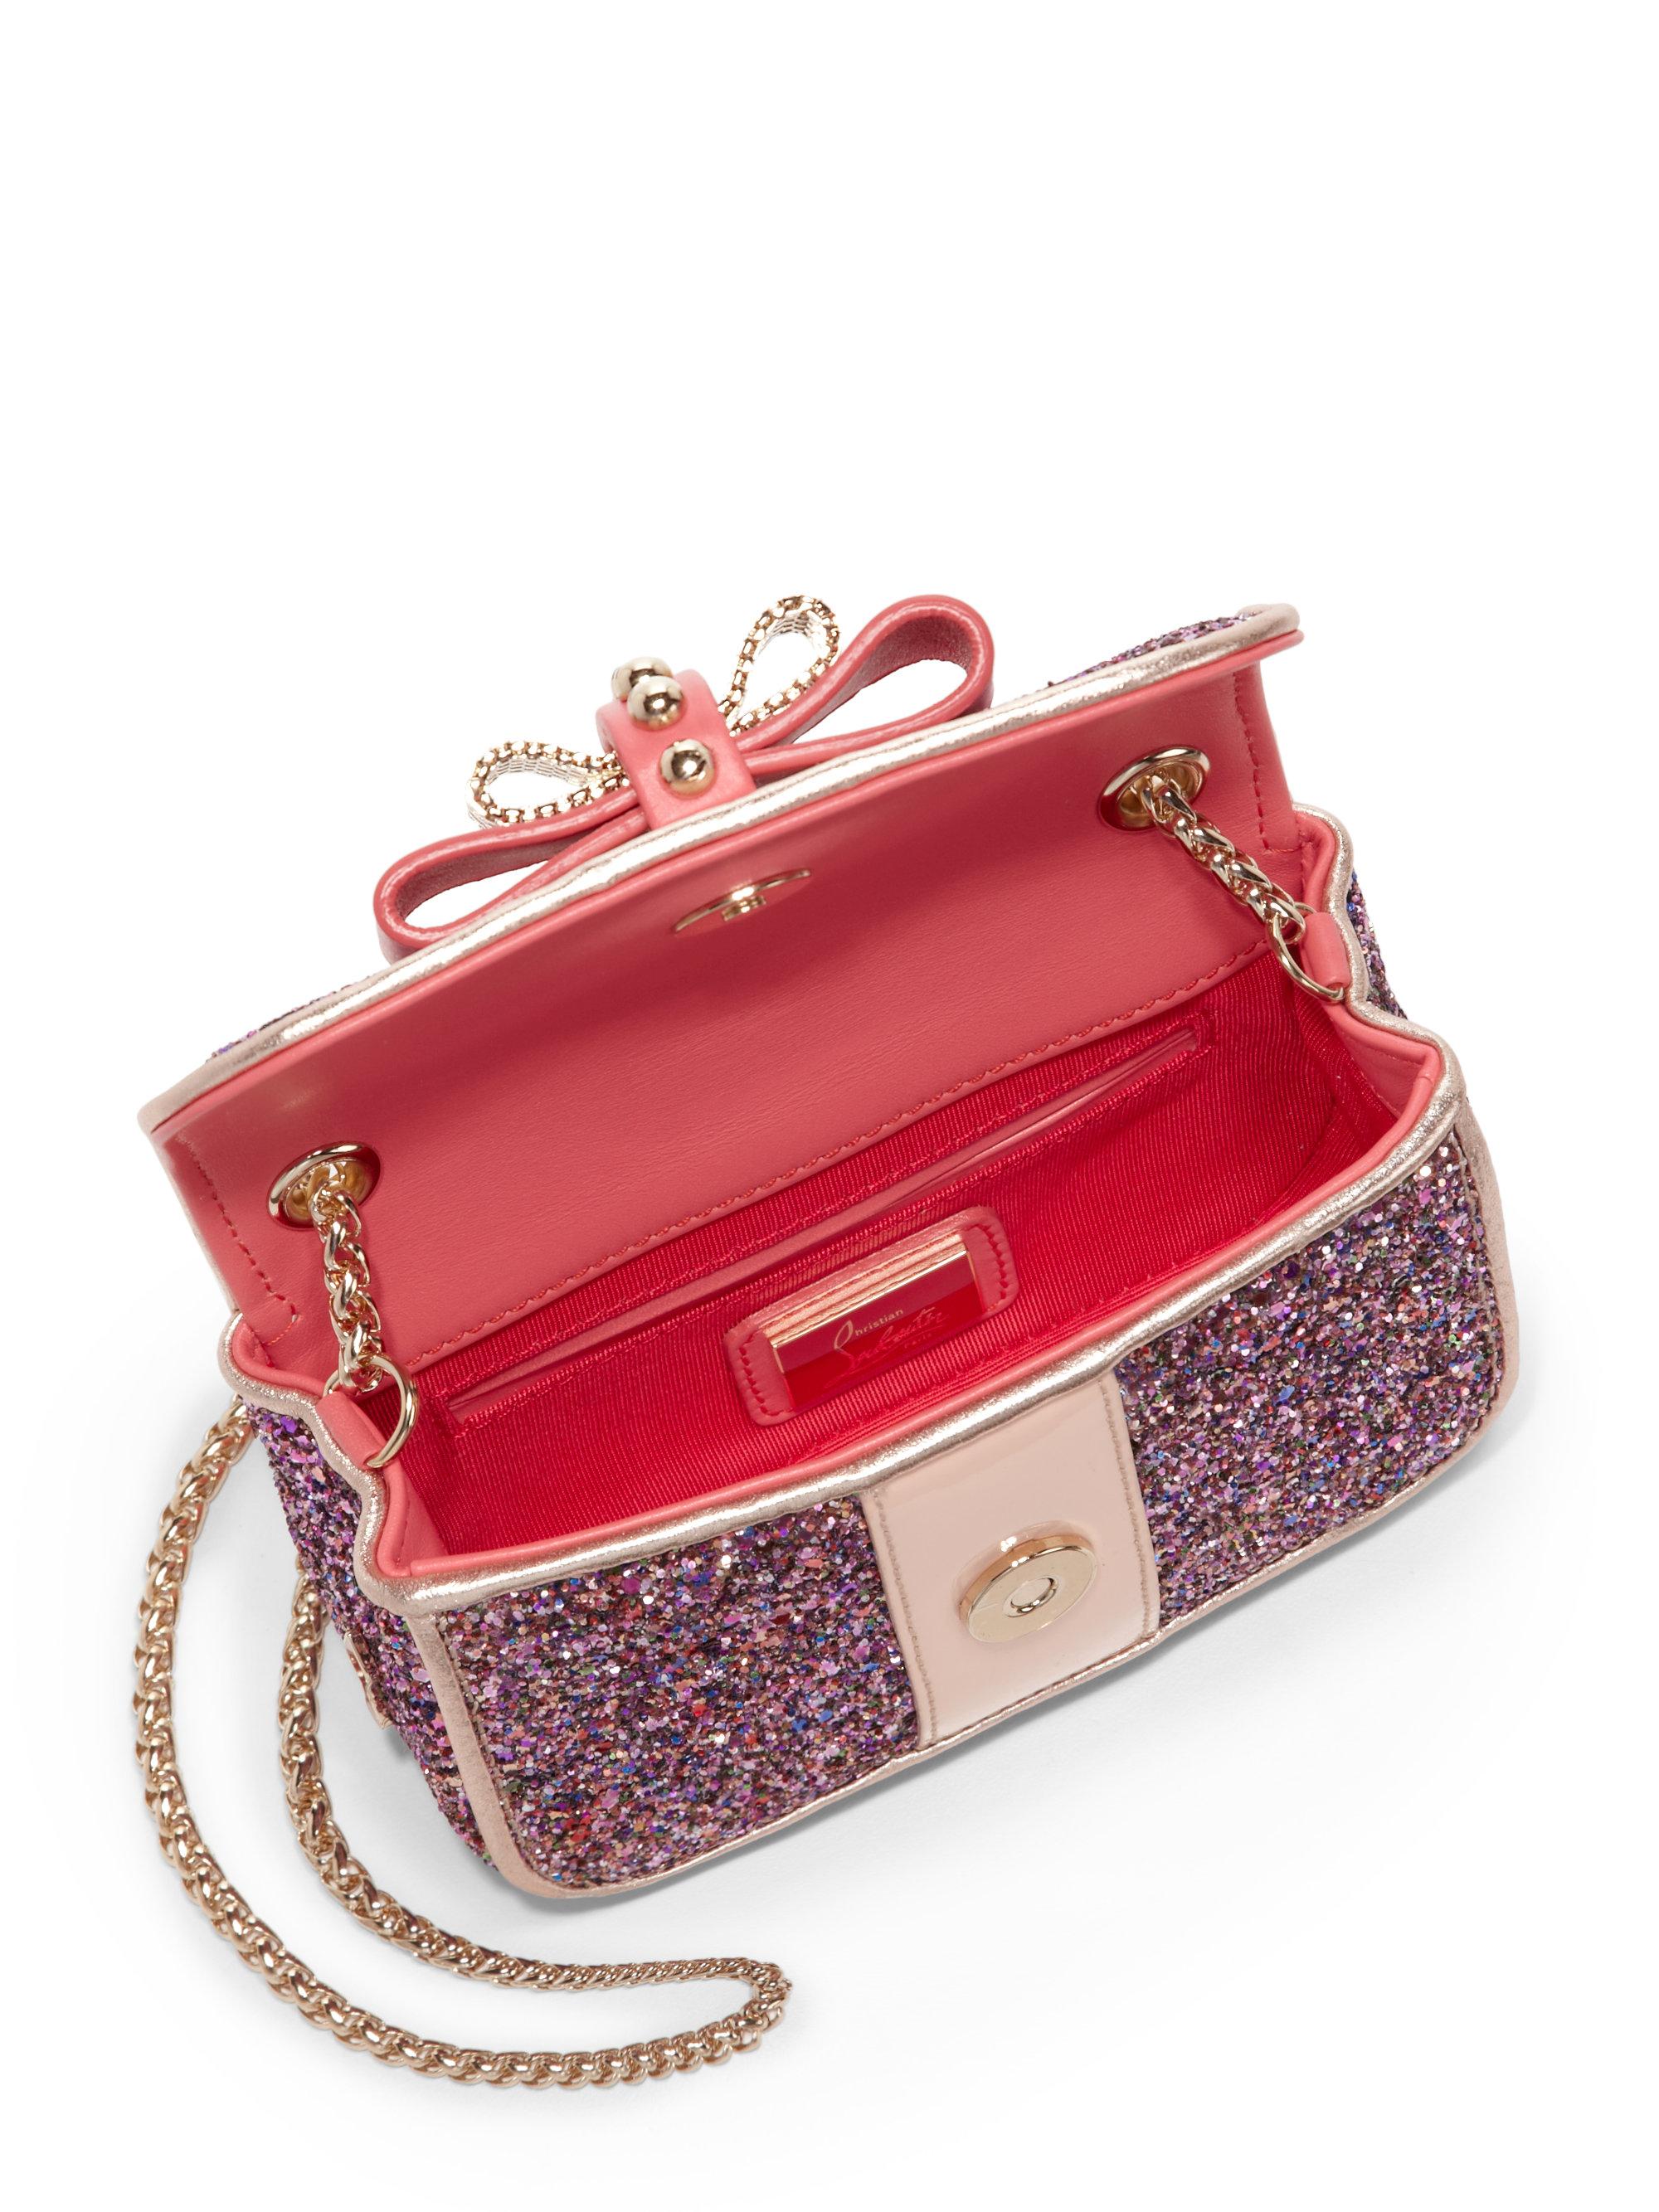 Sweet Charity rose gold shoulder bag Christian Louboutin ZE6WGAIytG